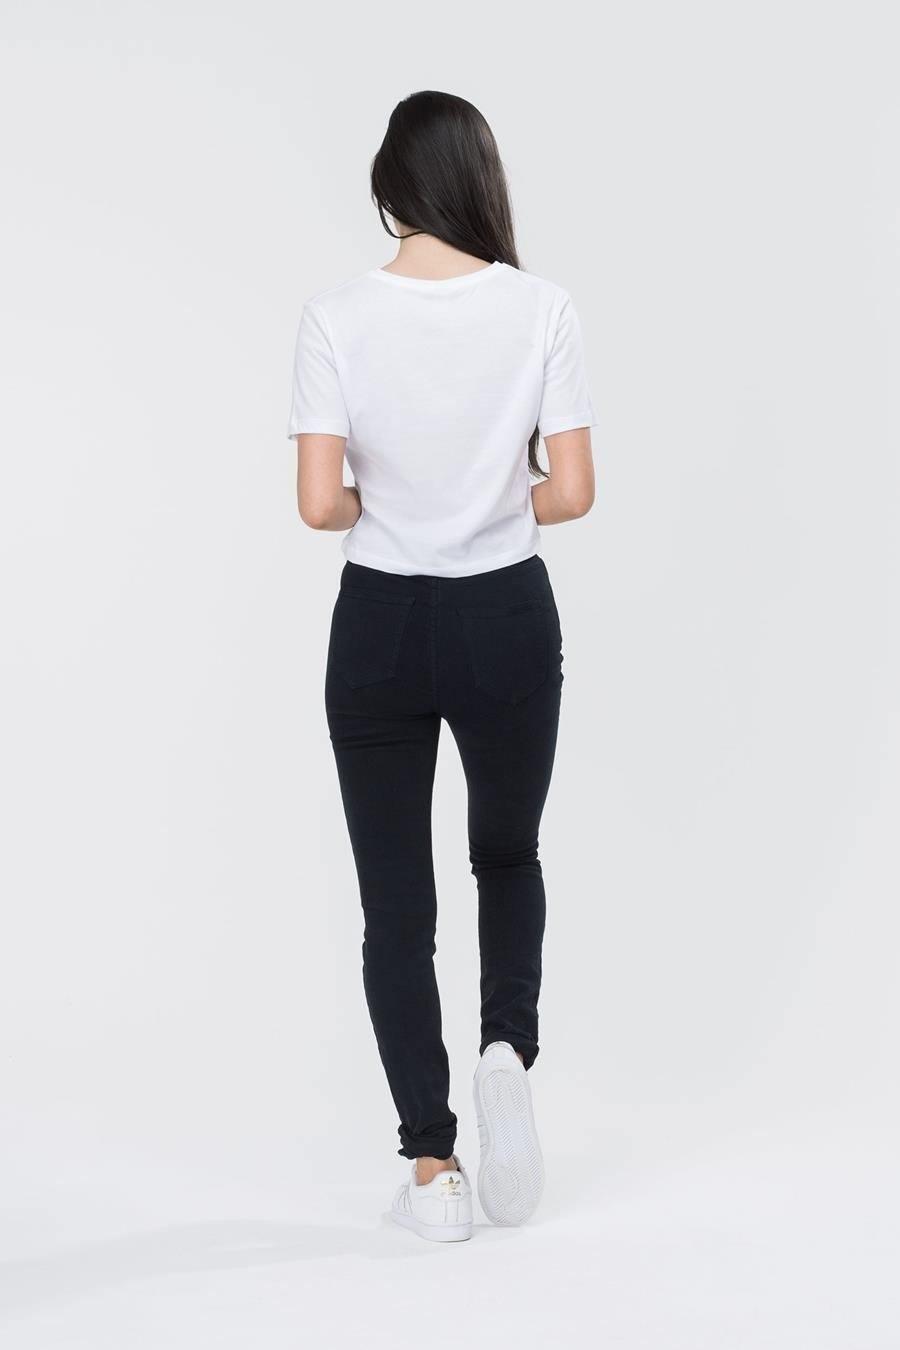 HYPE WhiteBlack Hype Script Women's Crop T Shirt